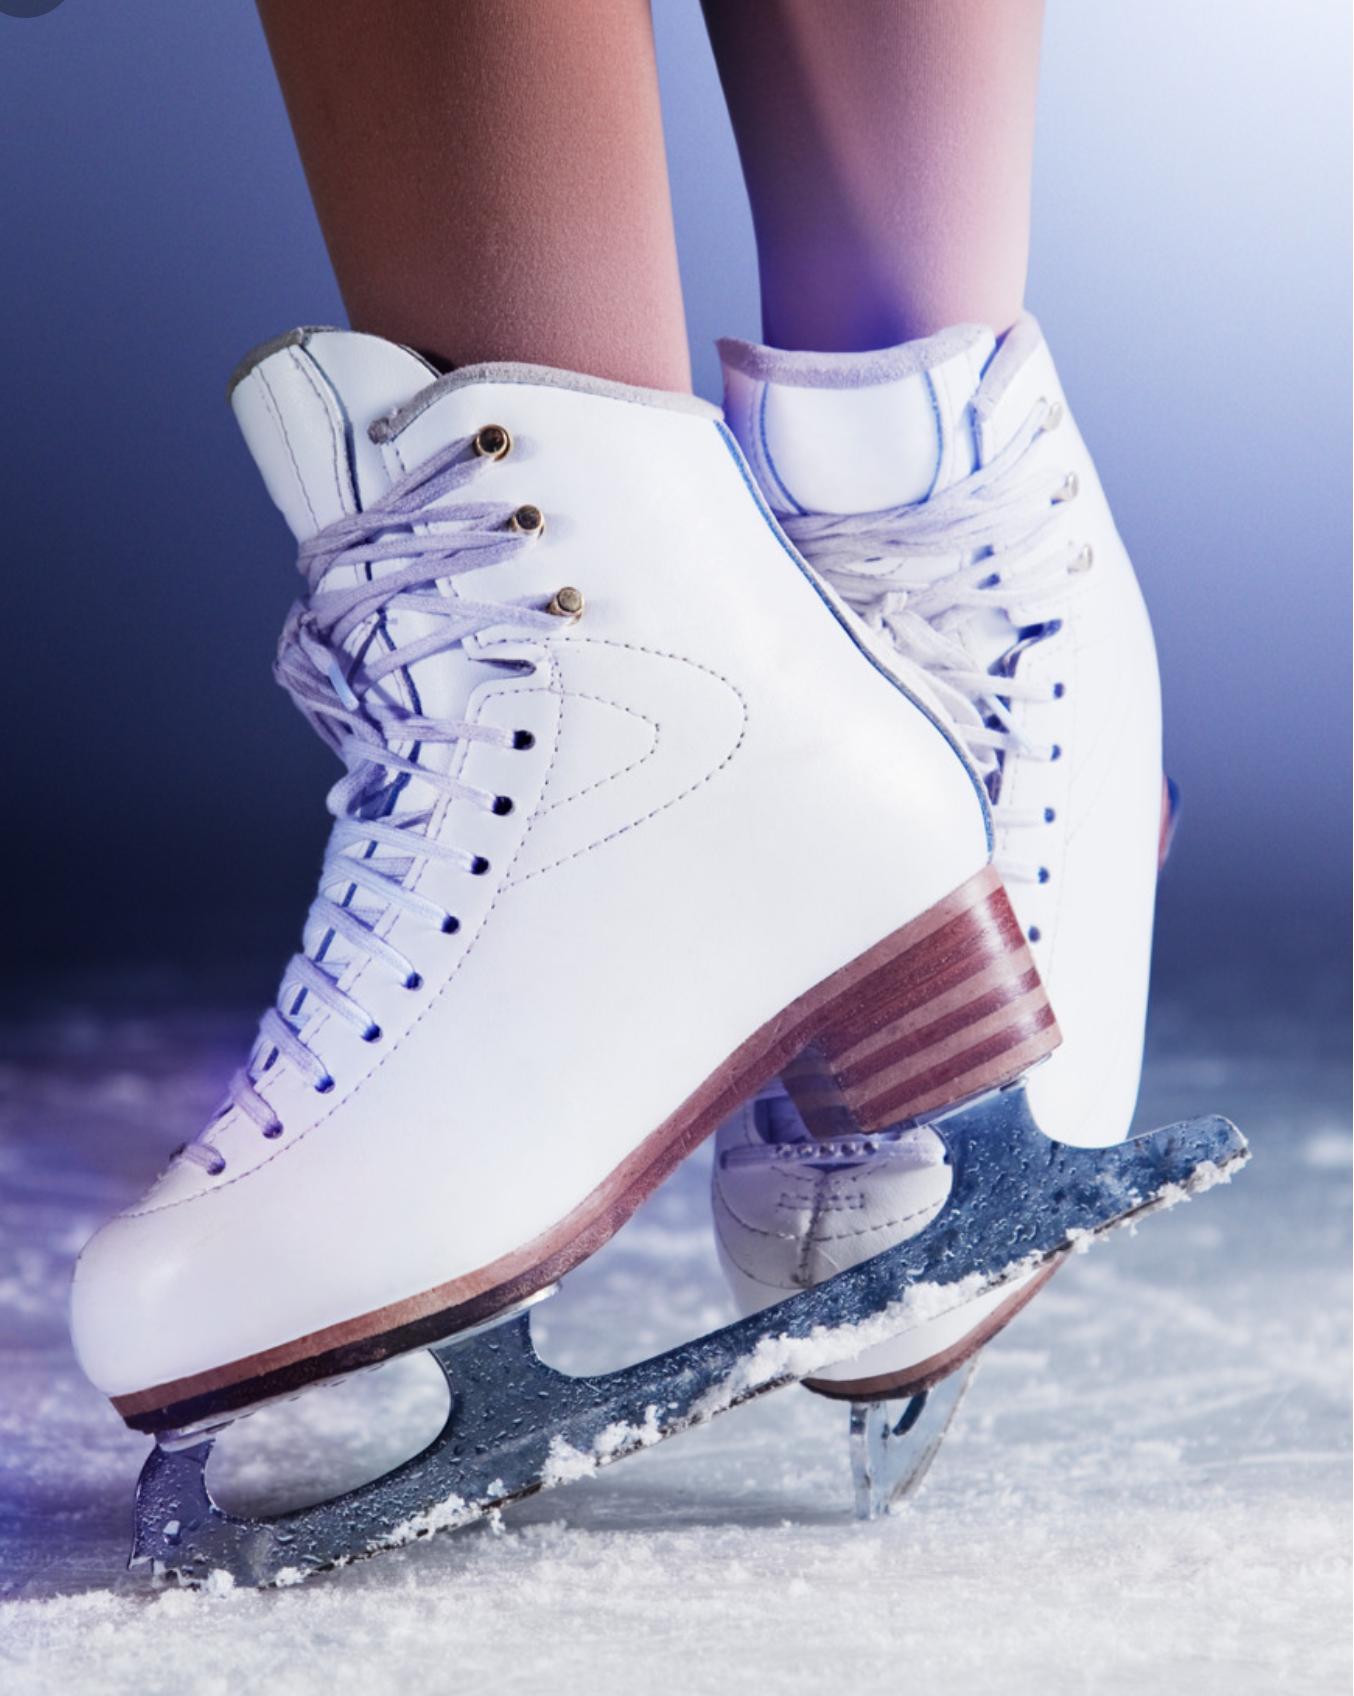 Precision Skate Sharpening